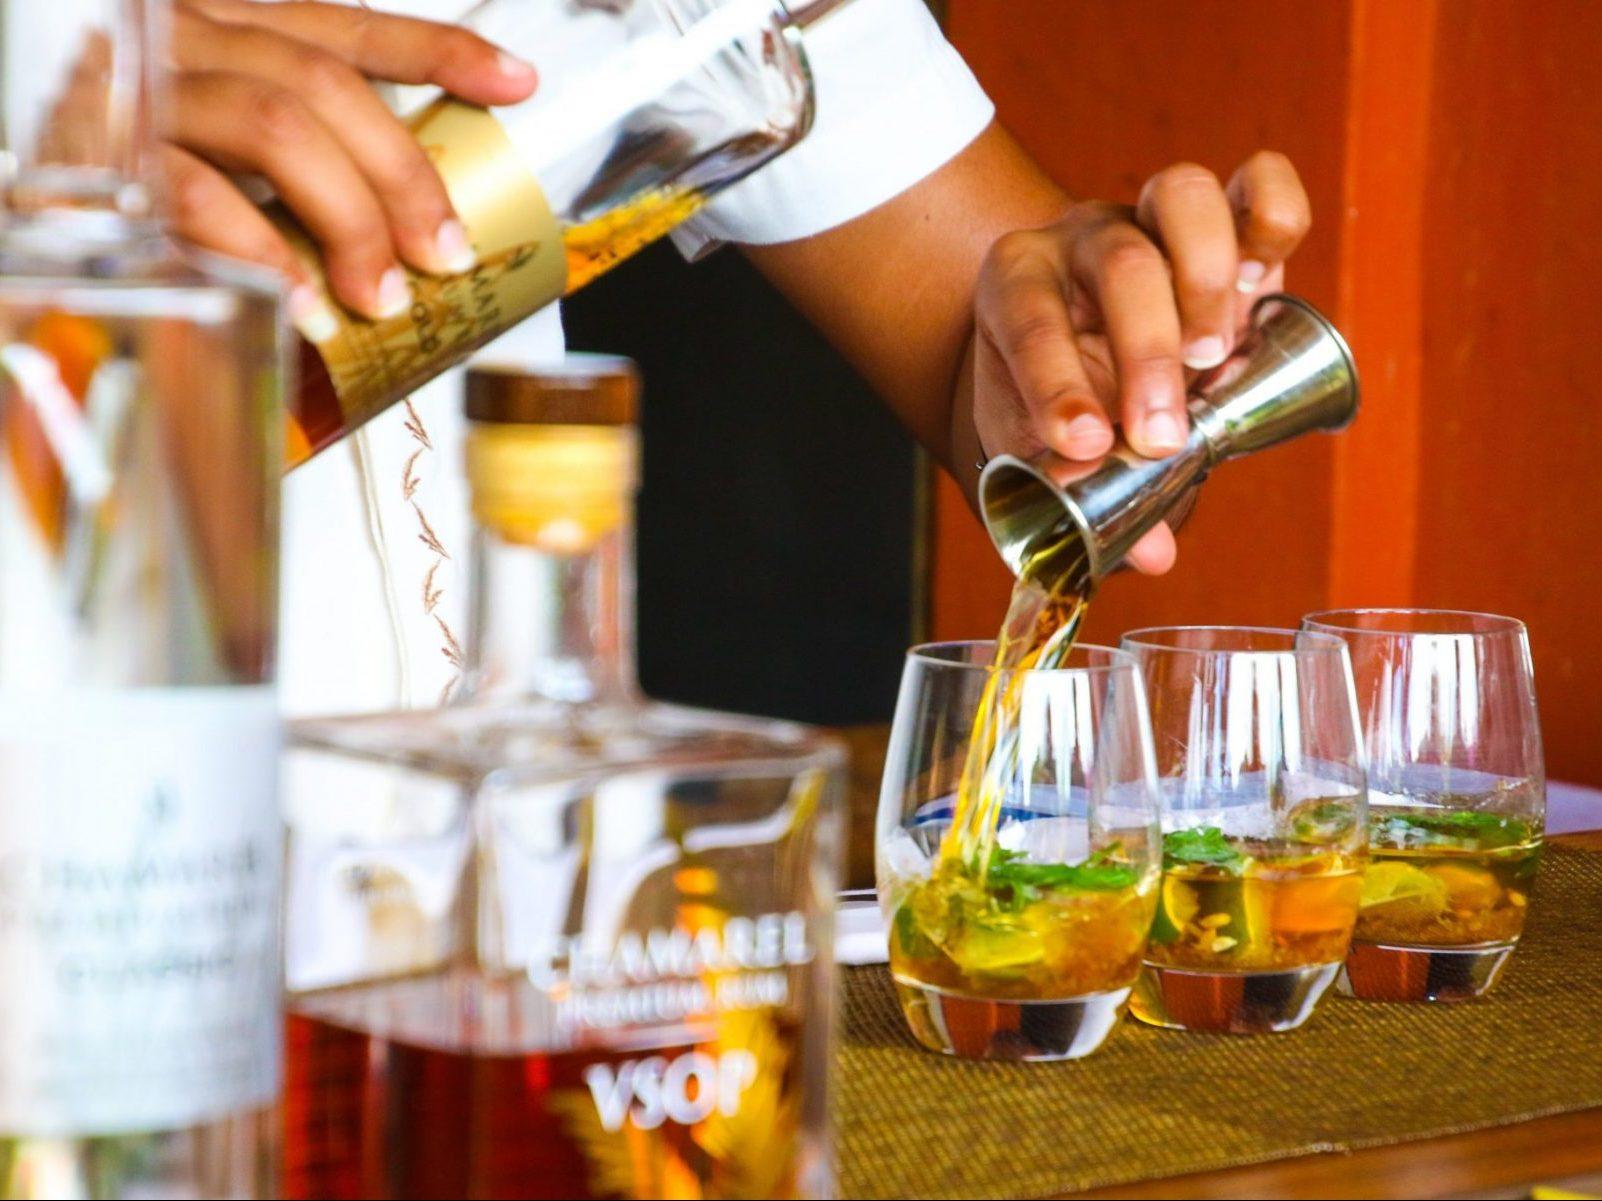 Hand Pouring Liquor Into Cocktail Glass